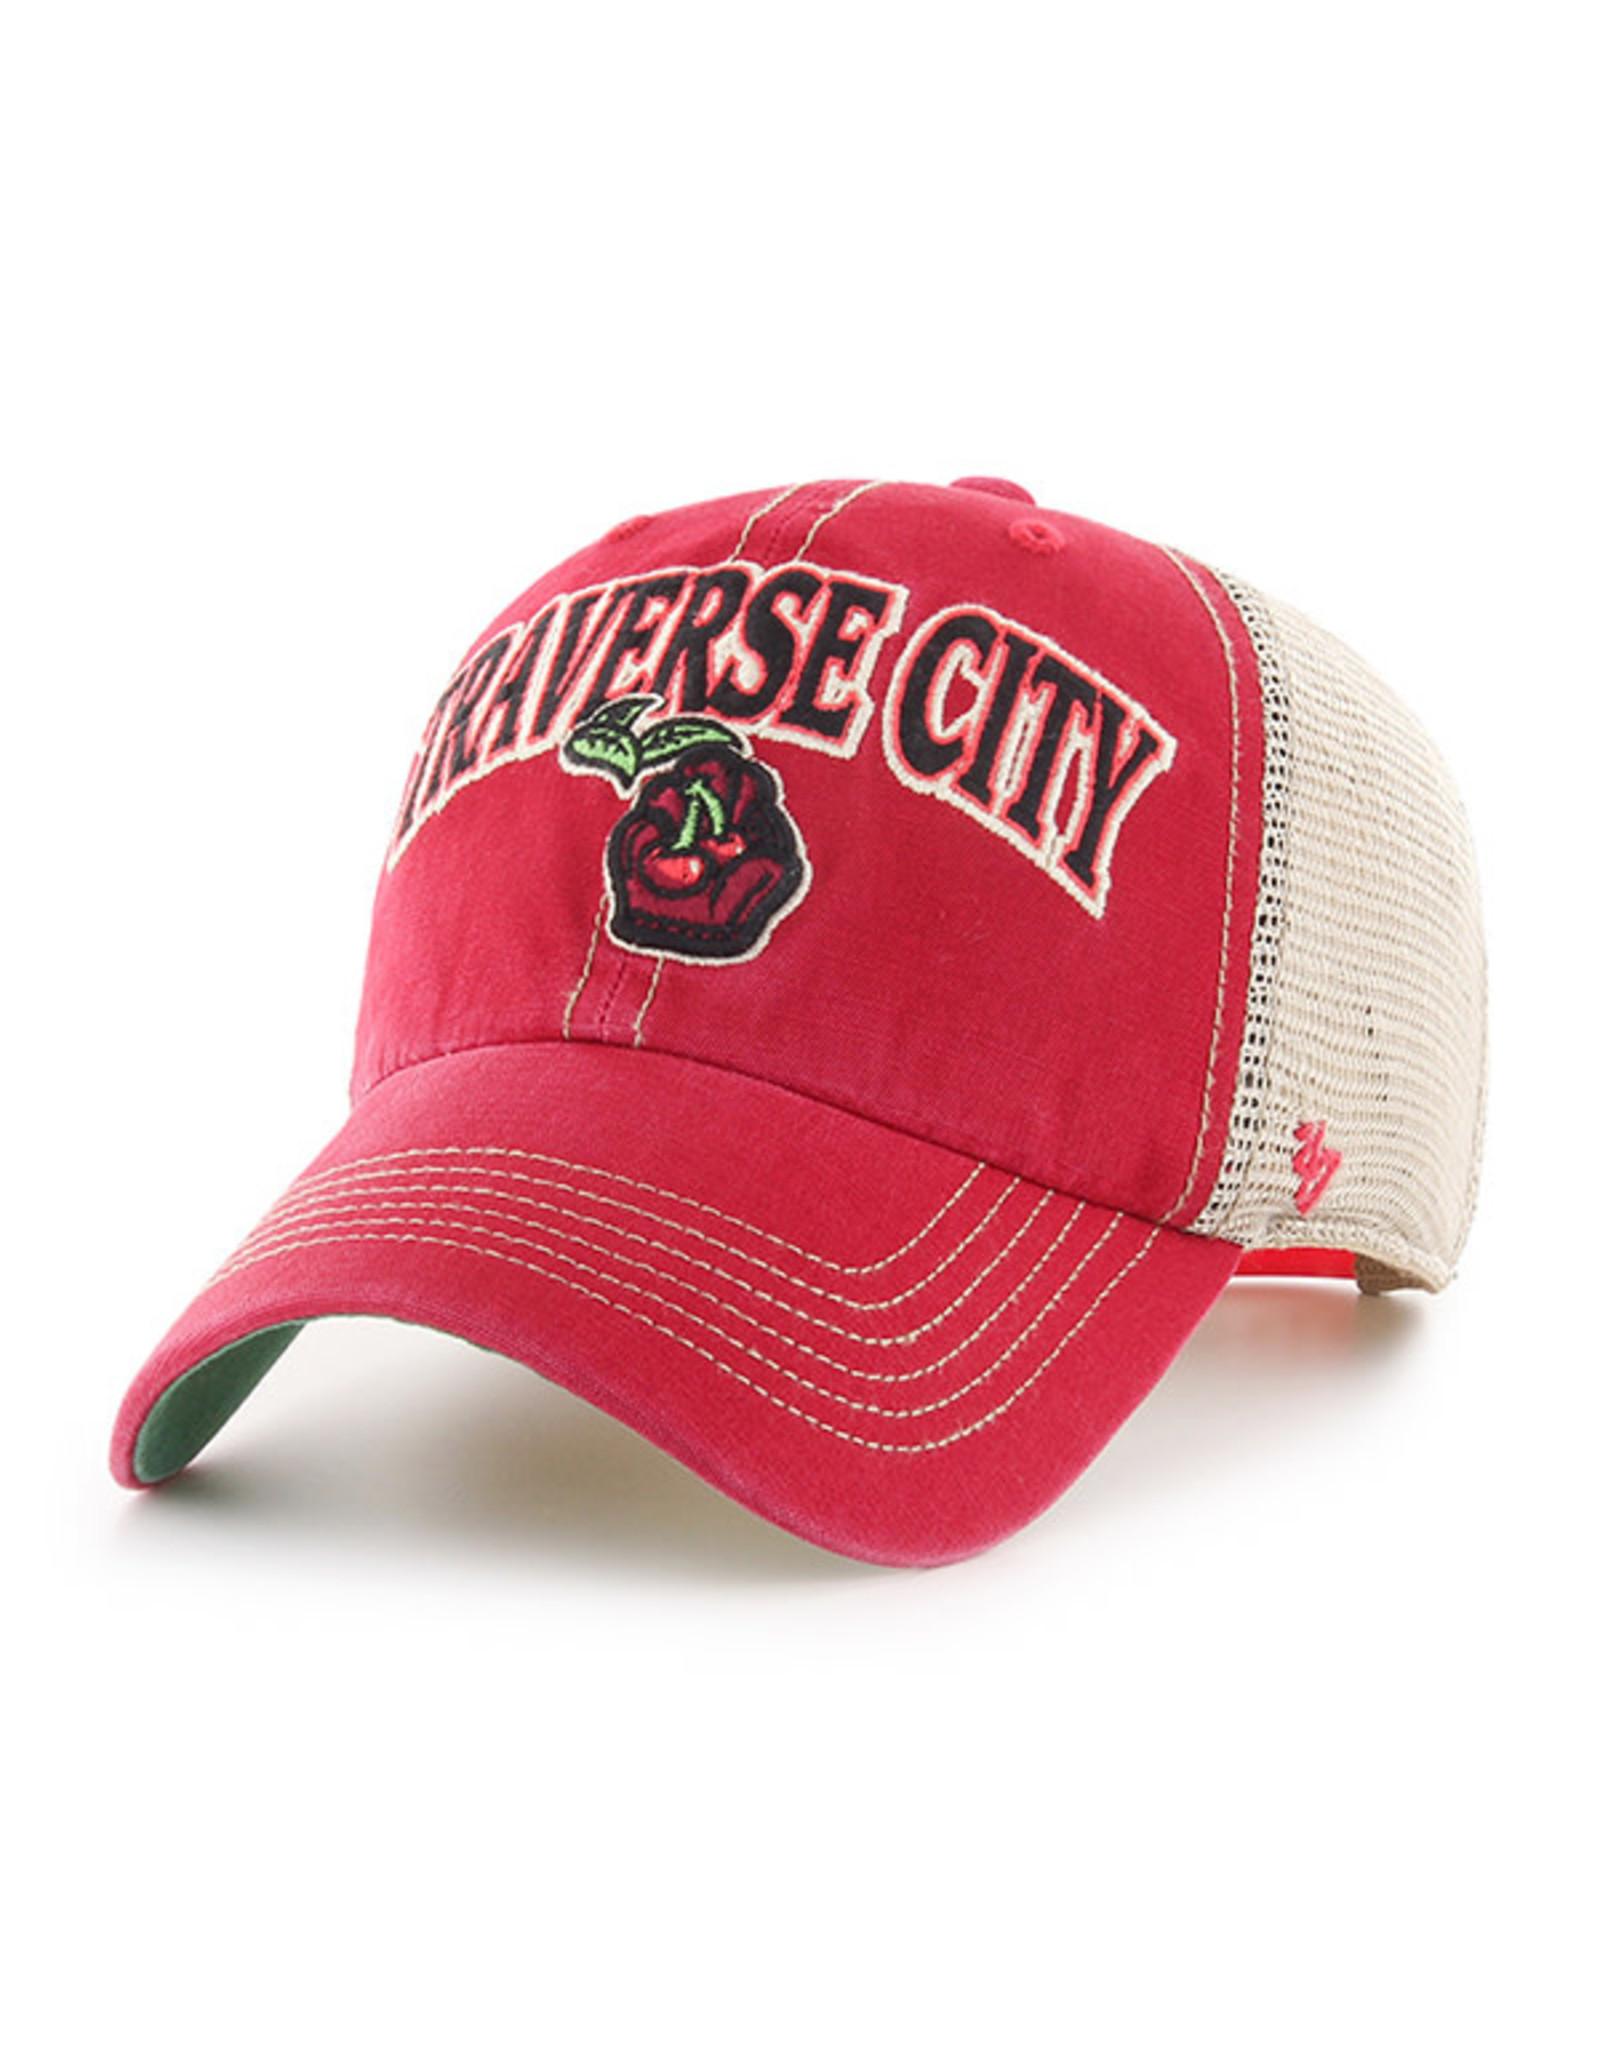 '47 Brand 1213 Tuscaloosa Arch Red/Khaki Mesh Clean Up Cap